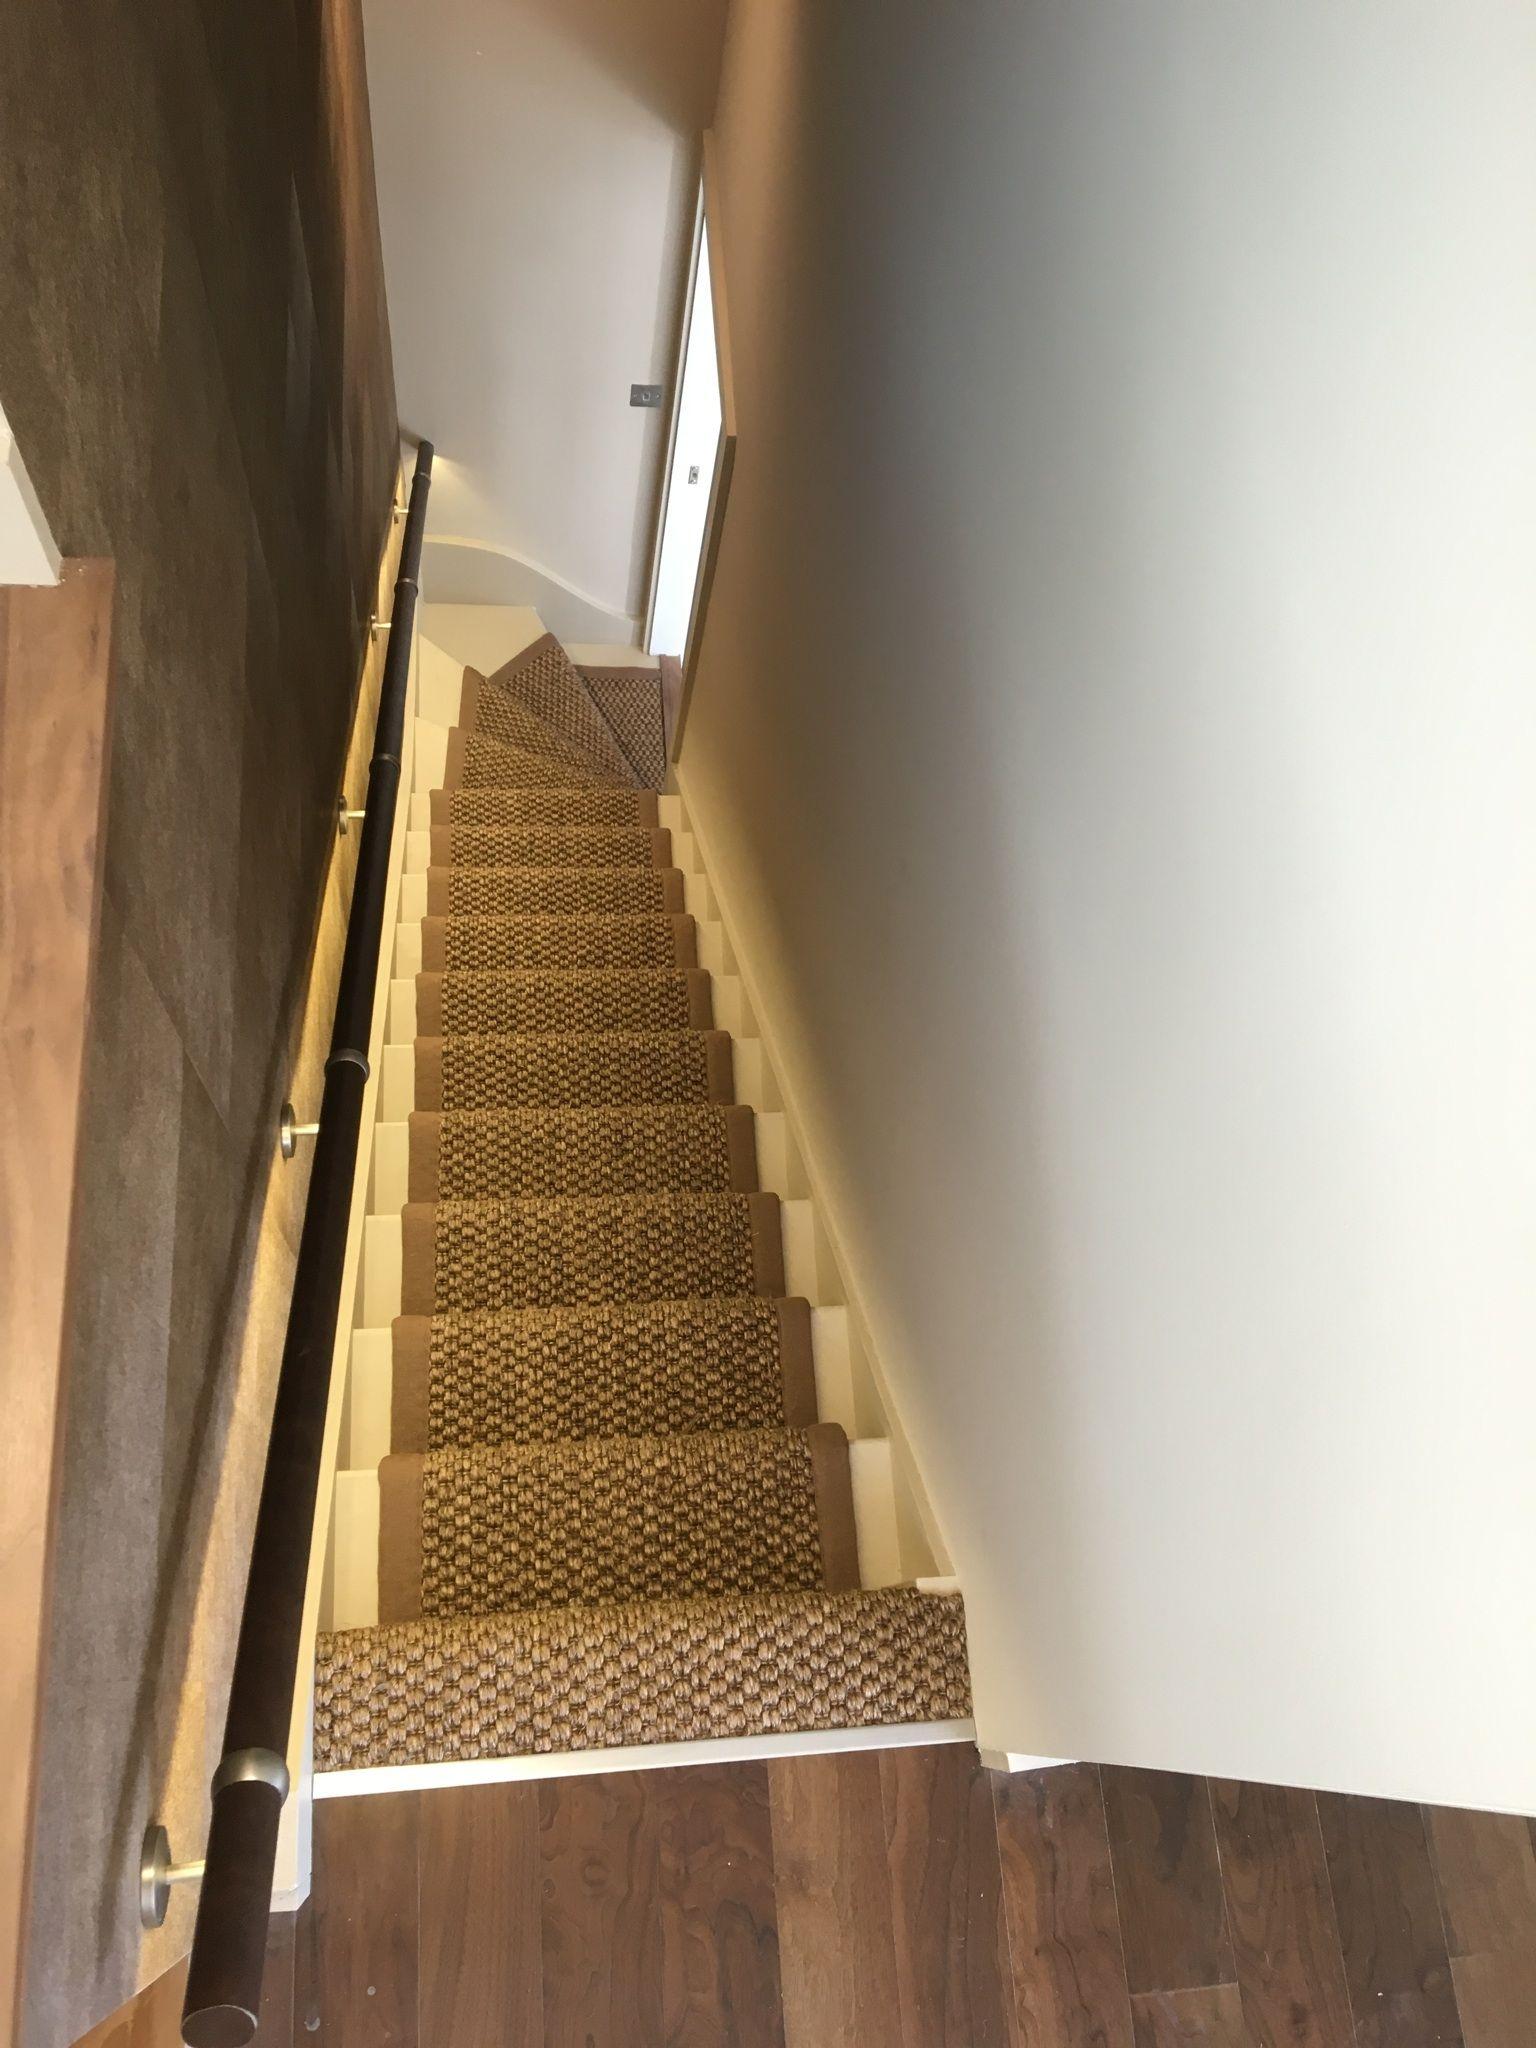 Bespoke Carpet Runners Created By Ben Champness For Higherground Camberley Higherground Co Uk Carpet Runner Carpet Home Decor